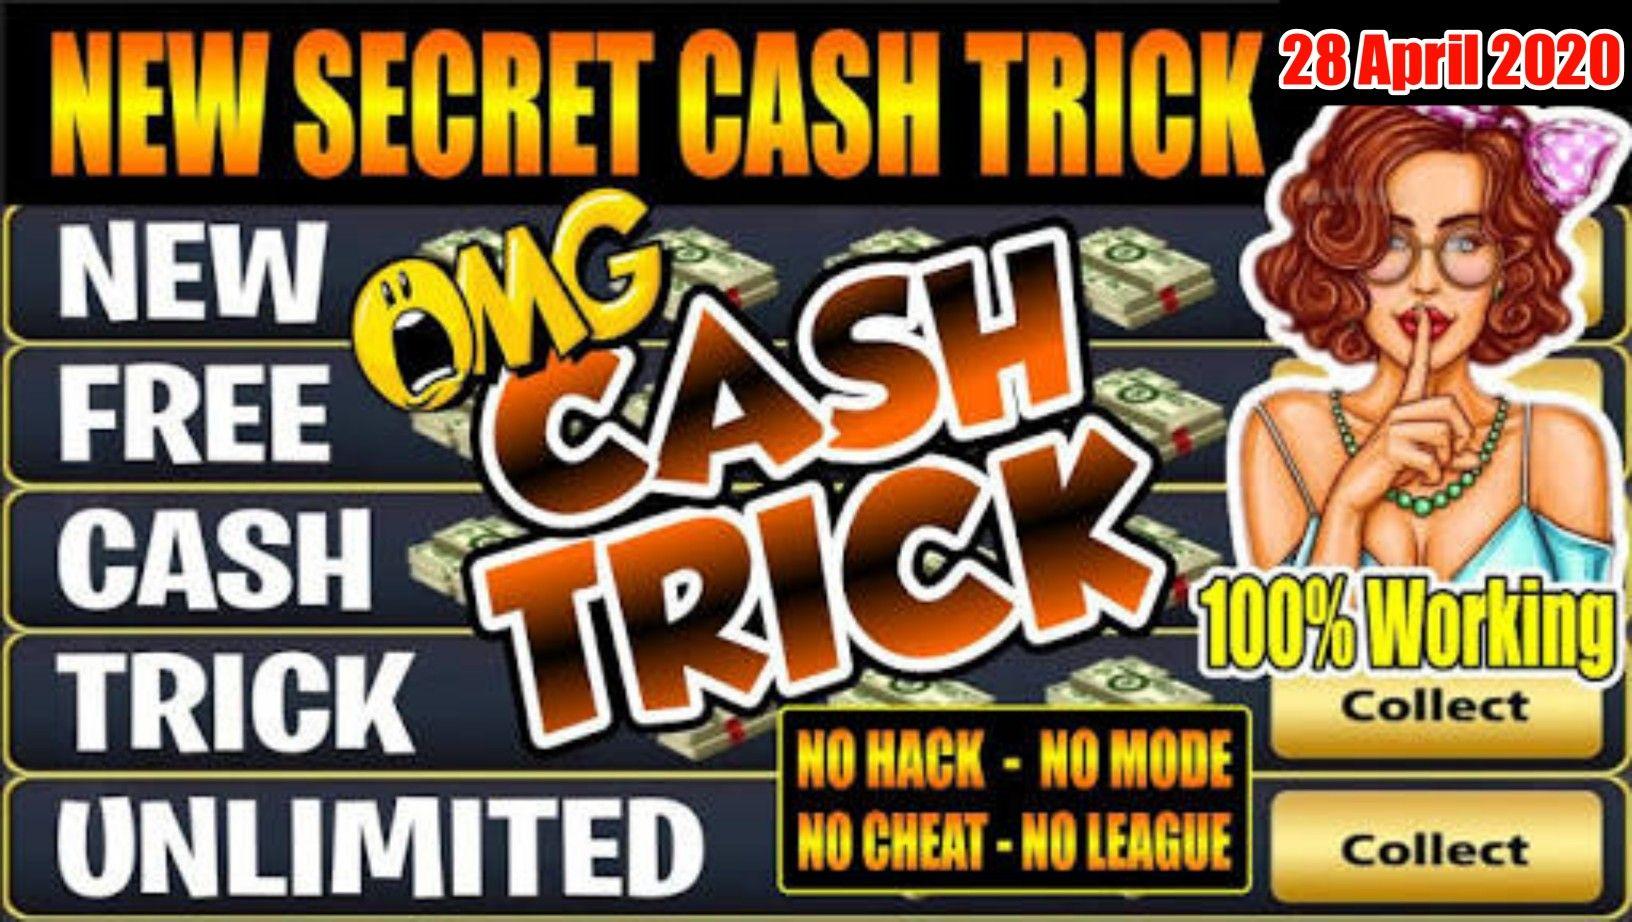 8 Ball Pool Cash Reward Link Pool Balls Pool Coins Cash Rewards